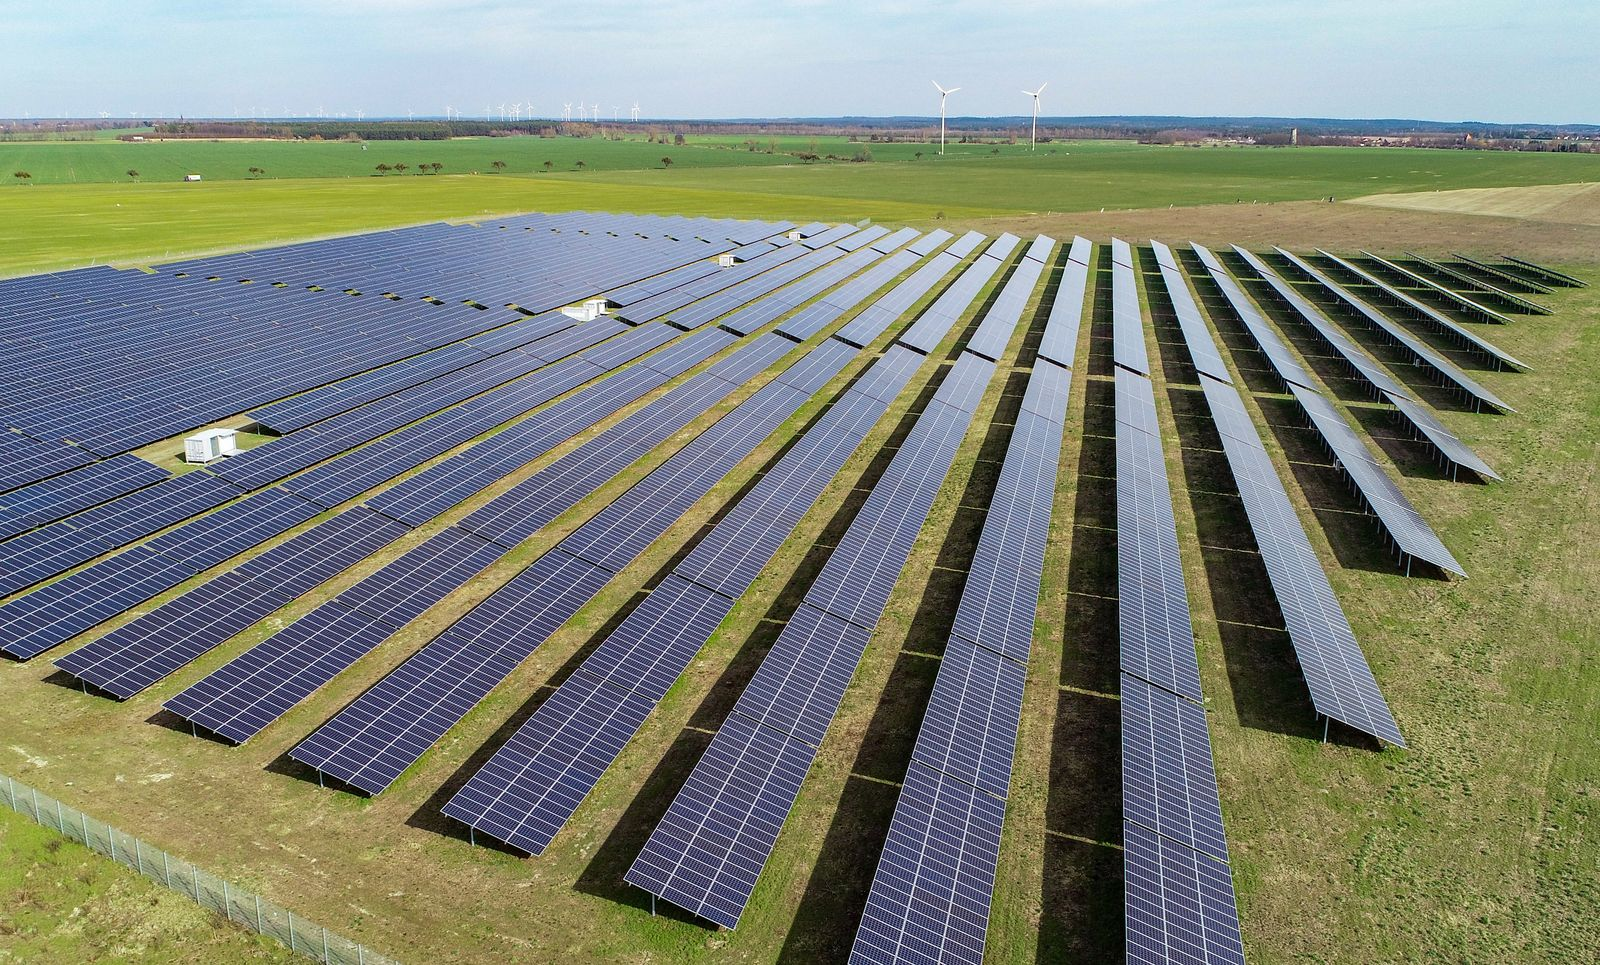 Mai-Sonne treibt Solarstromerzeugung kräftig an